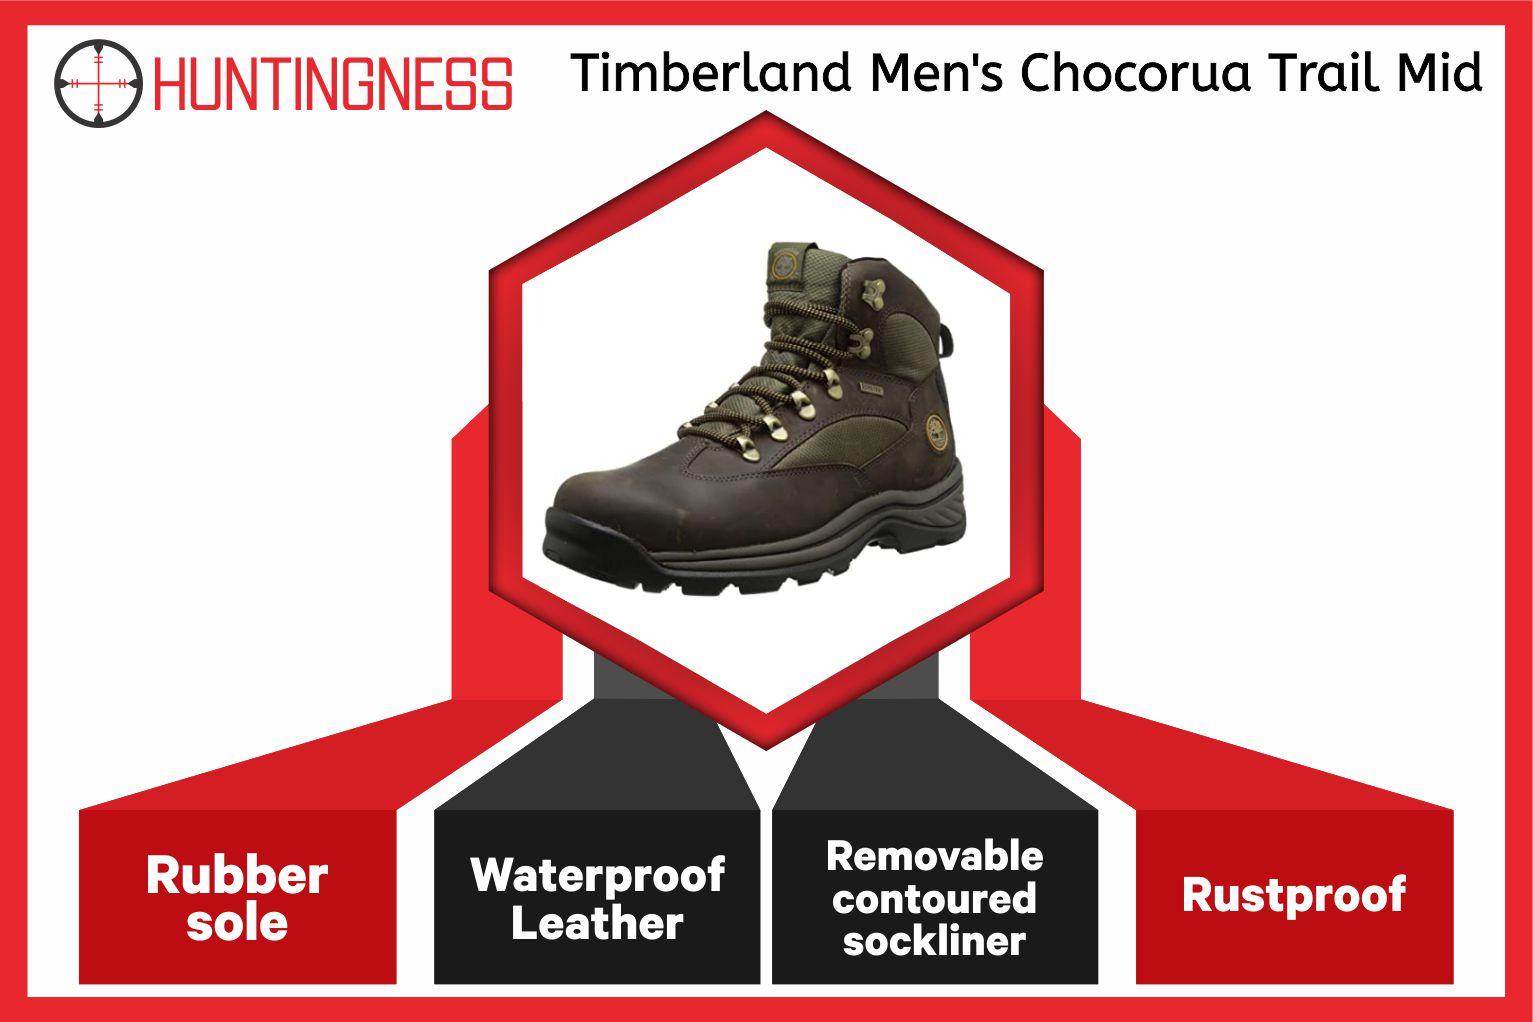 Timberland Men's Chocorua - Best Hunting Boots for Plantar Fasciitis Infographics